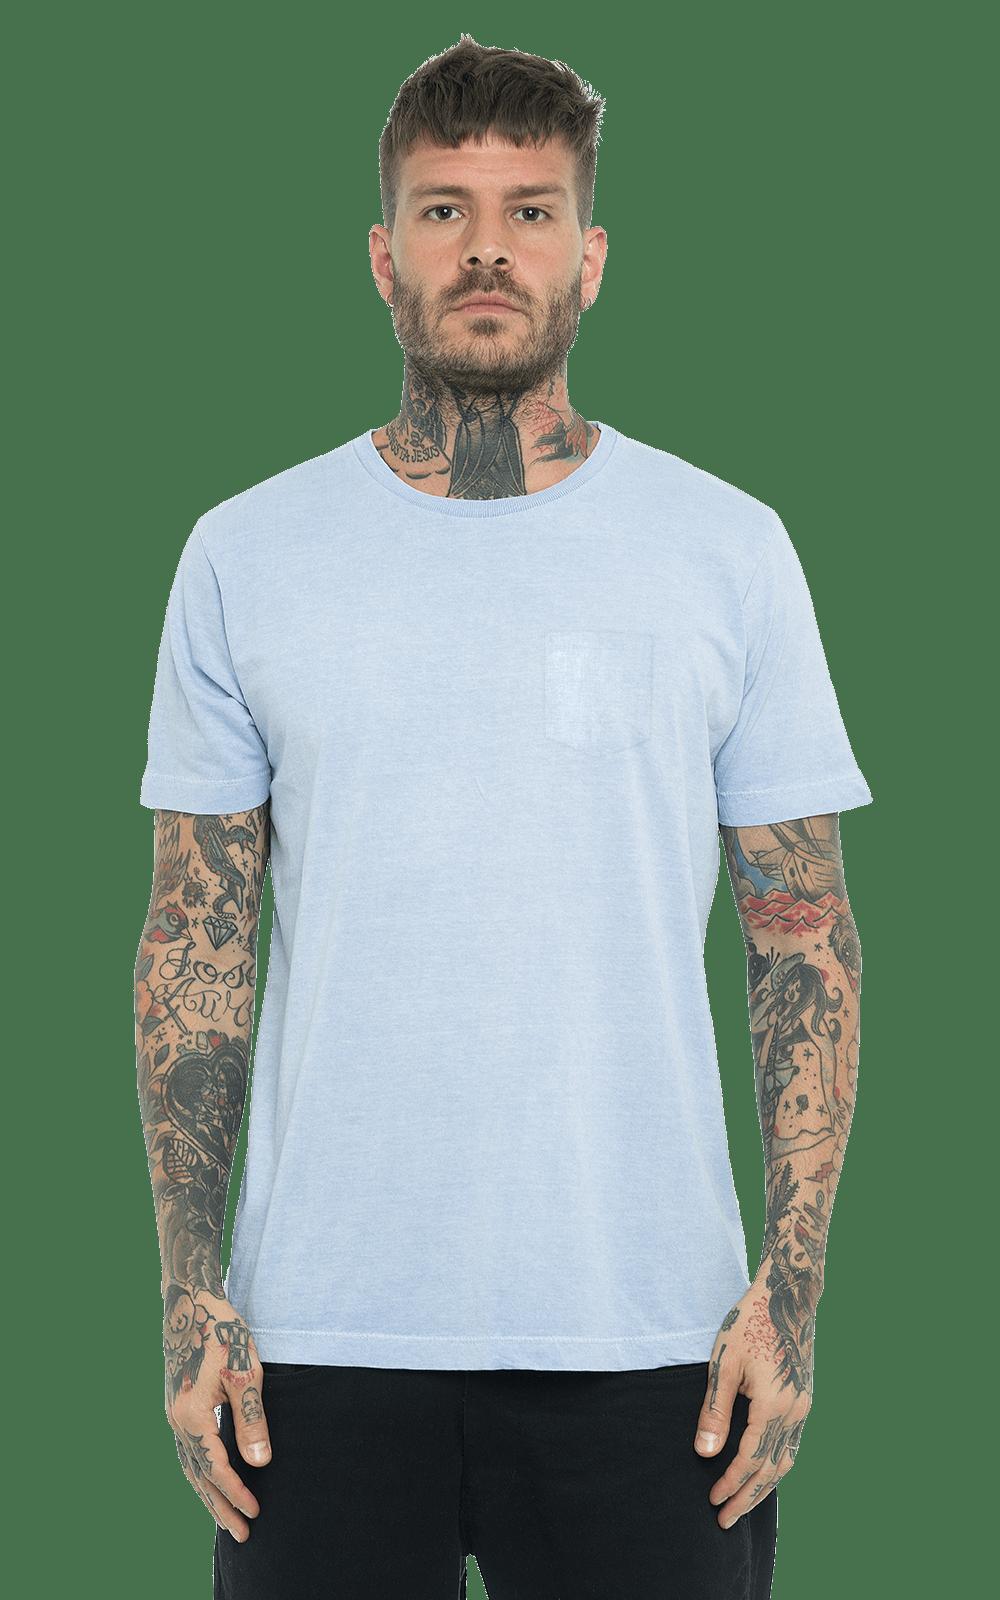 Camiseta_TinturadaBolso_SoftBlue_Frente